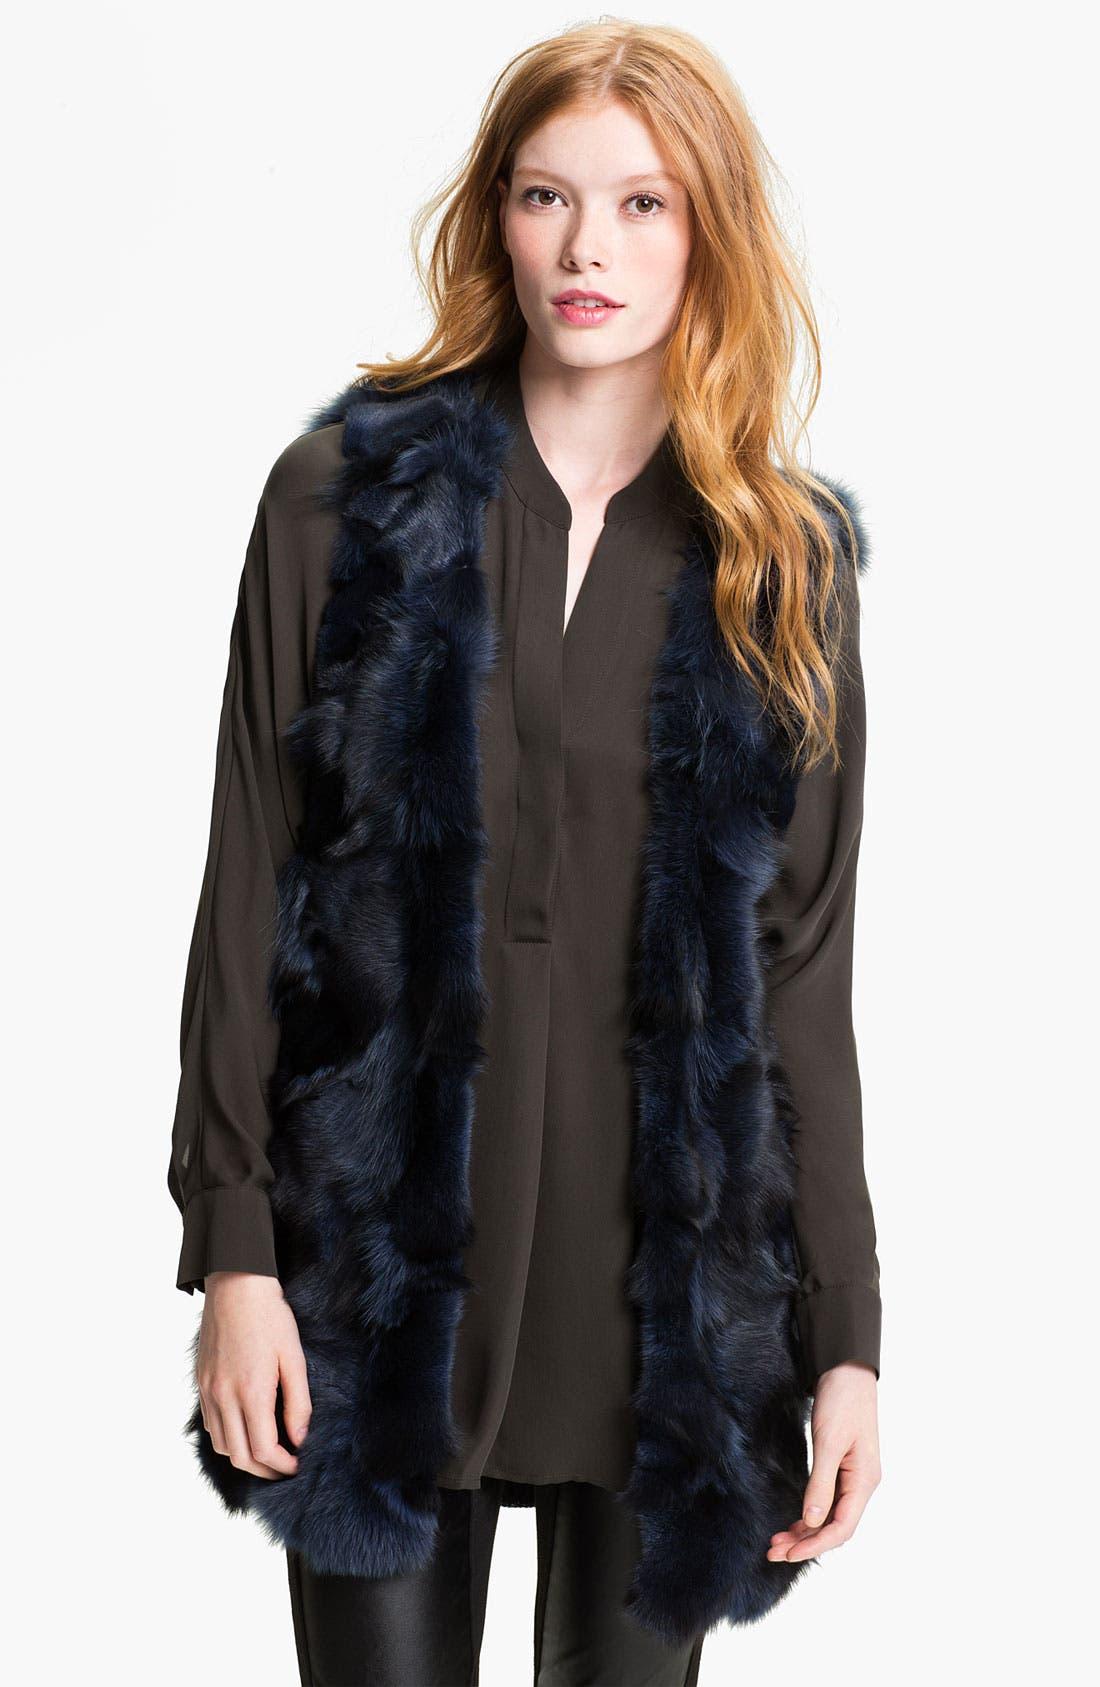 Alternate Image 1 Selected - Alberto Makali Genuine Fox Fur & Knit Vest (Online Exclusive)